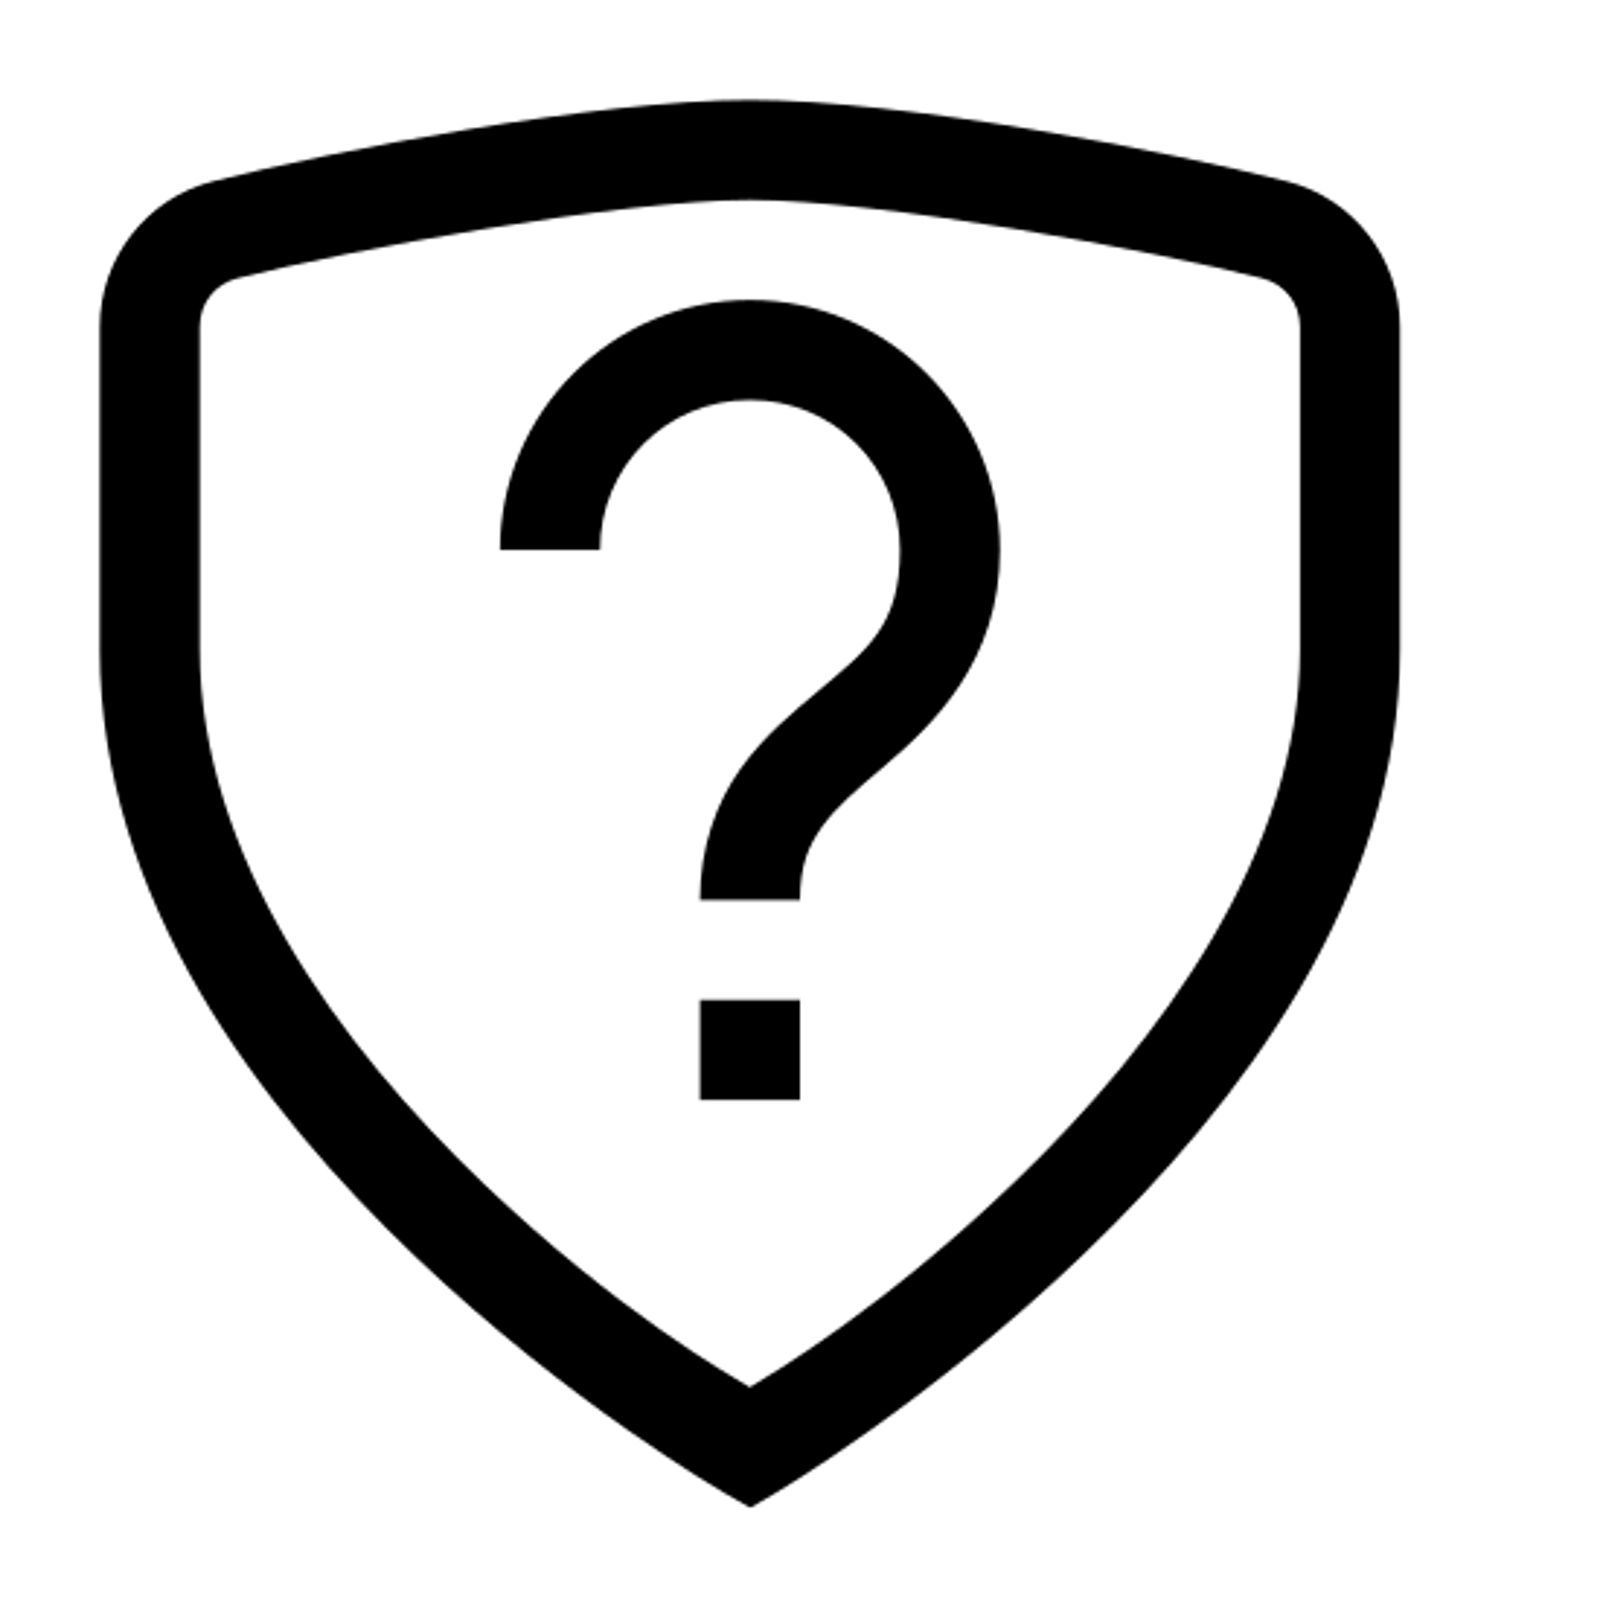 Escudo de pergunta icon